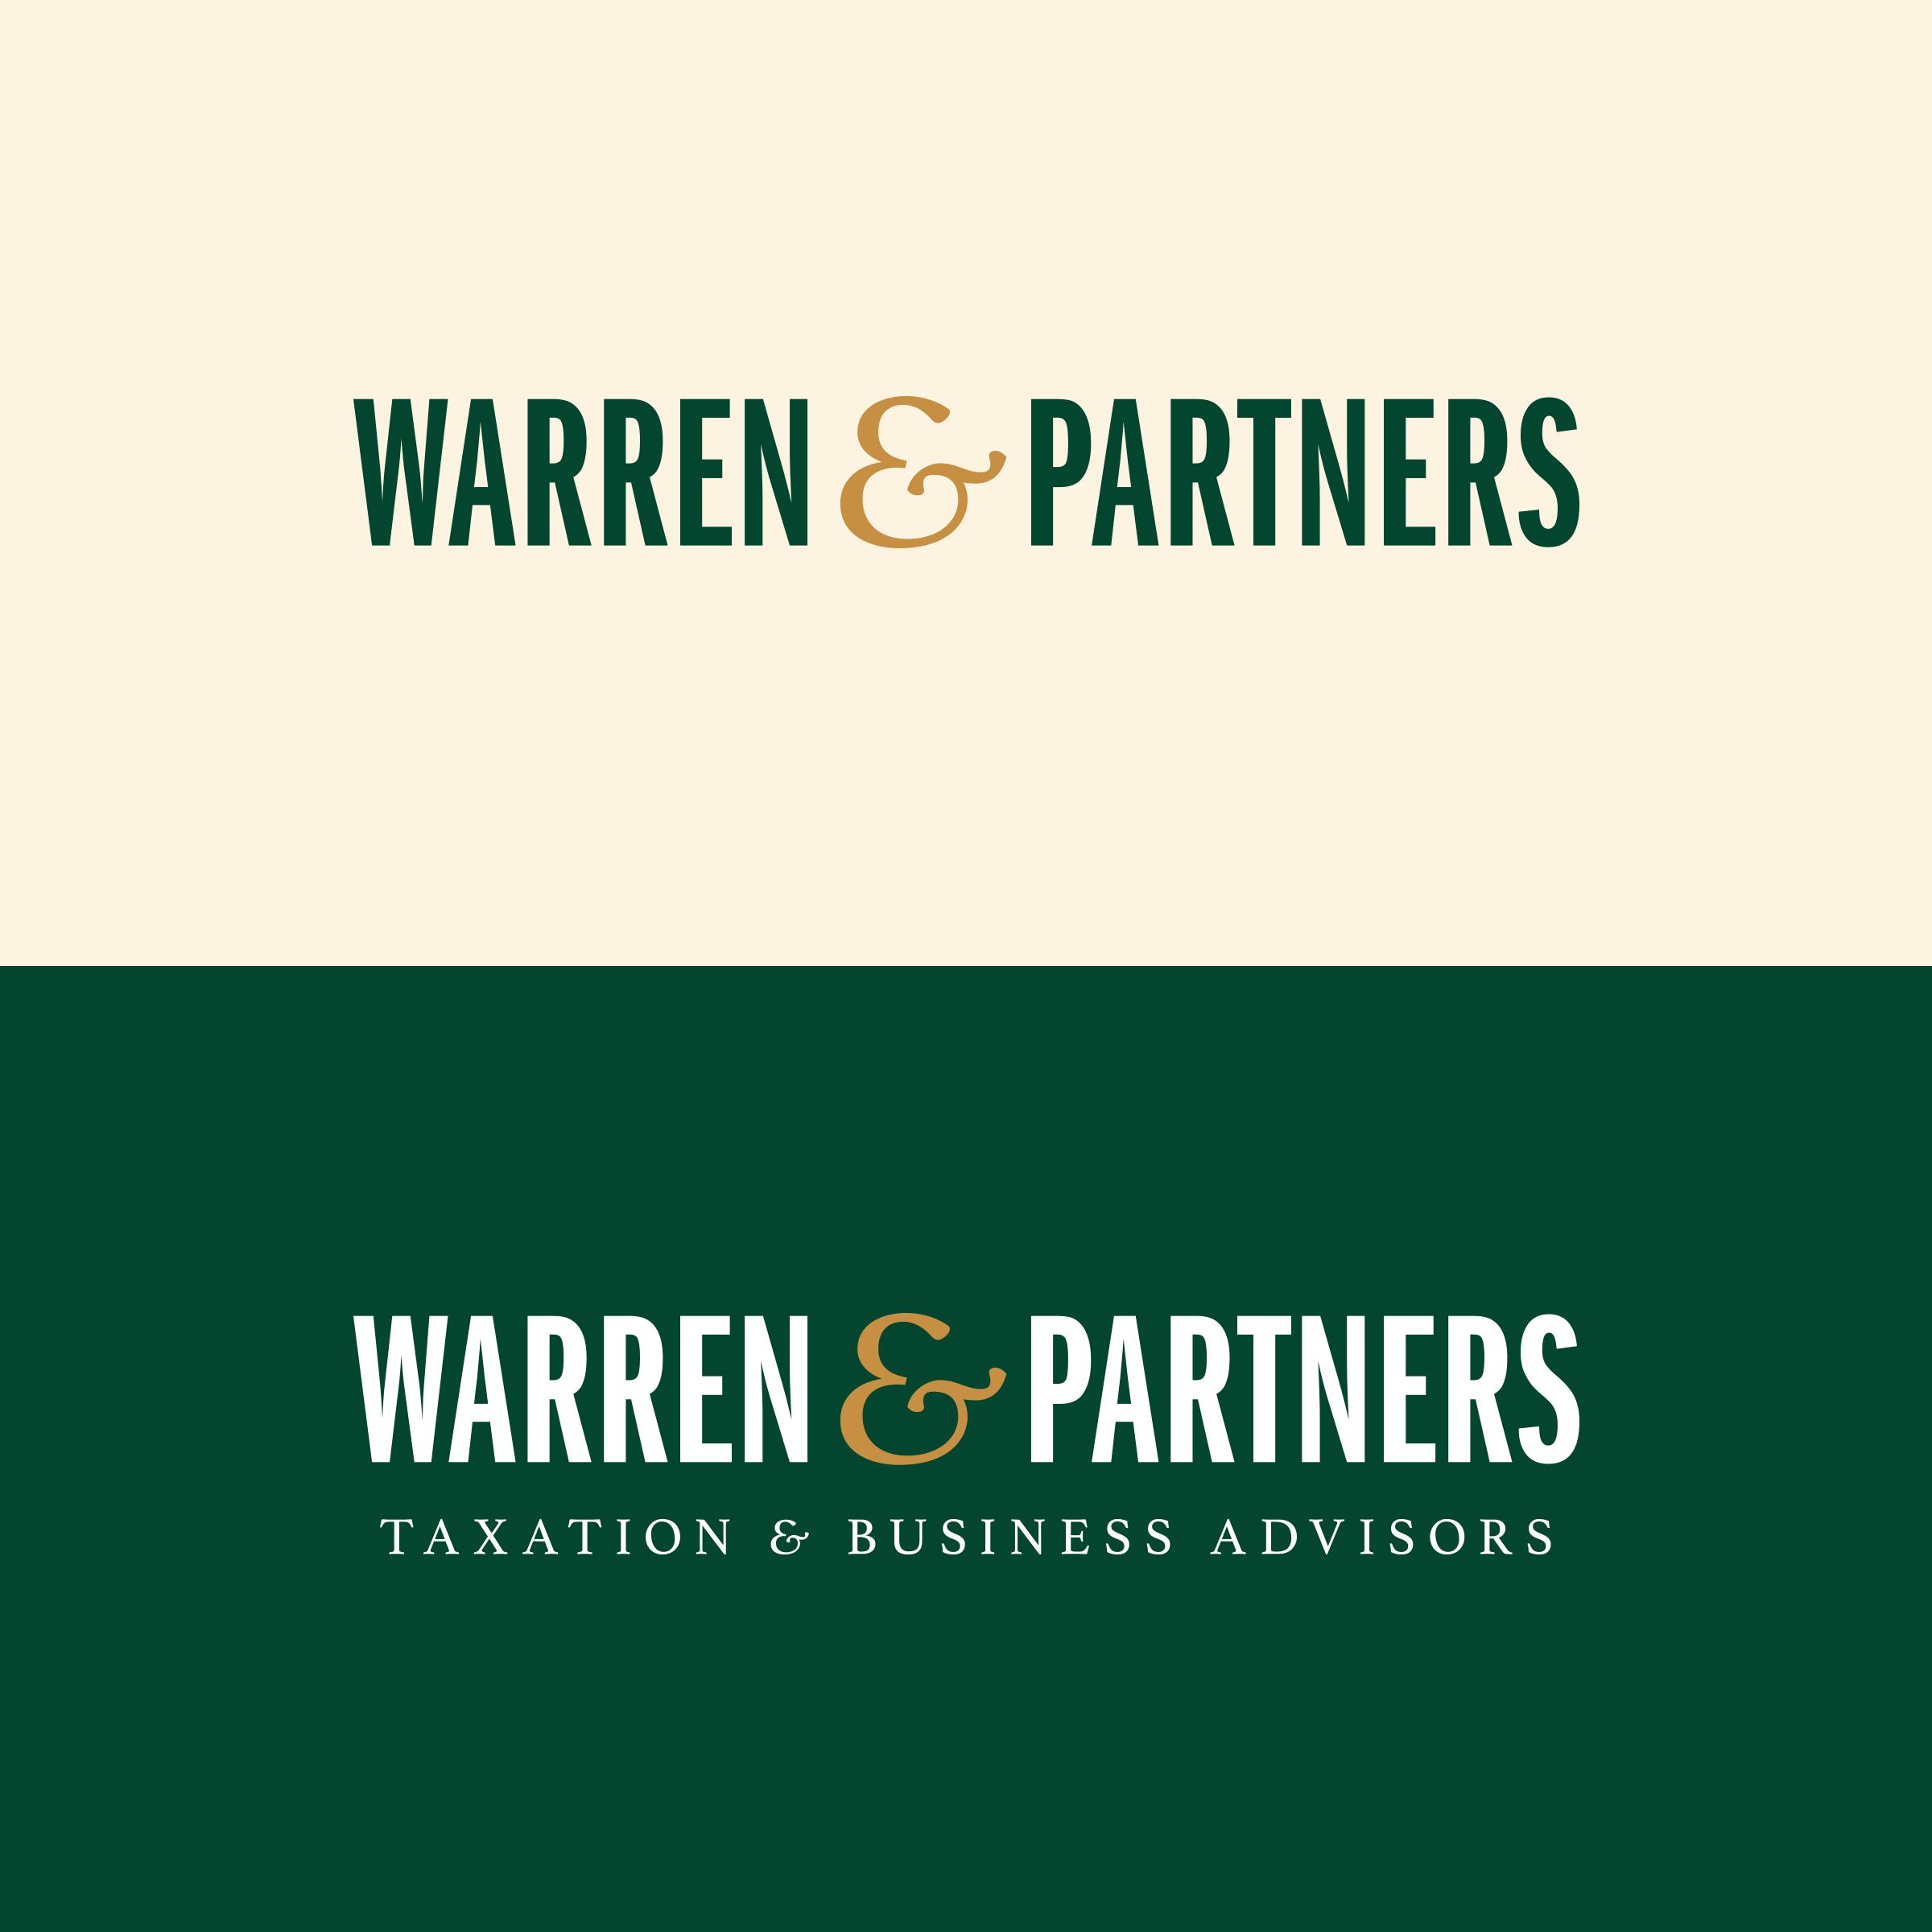 Warren & Partners brand logo